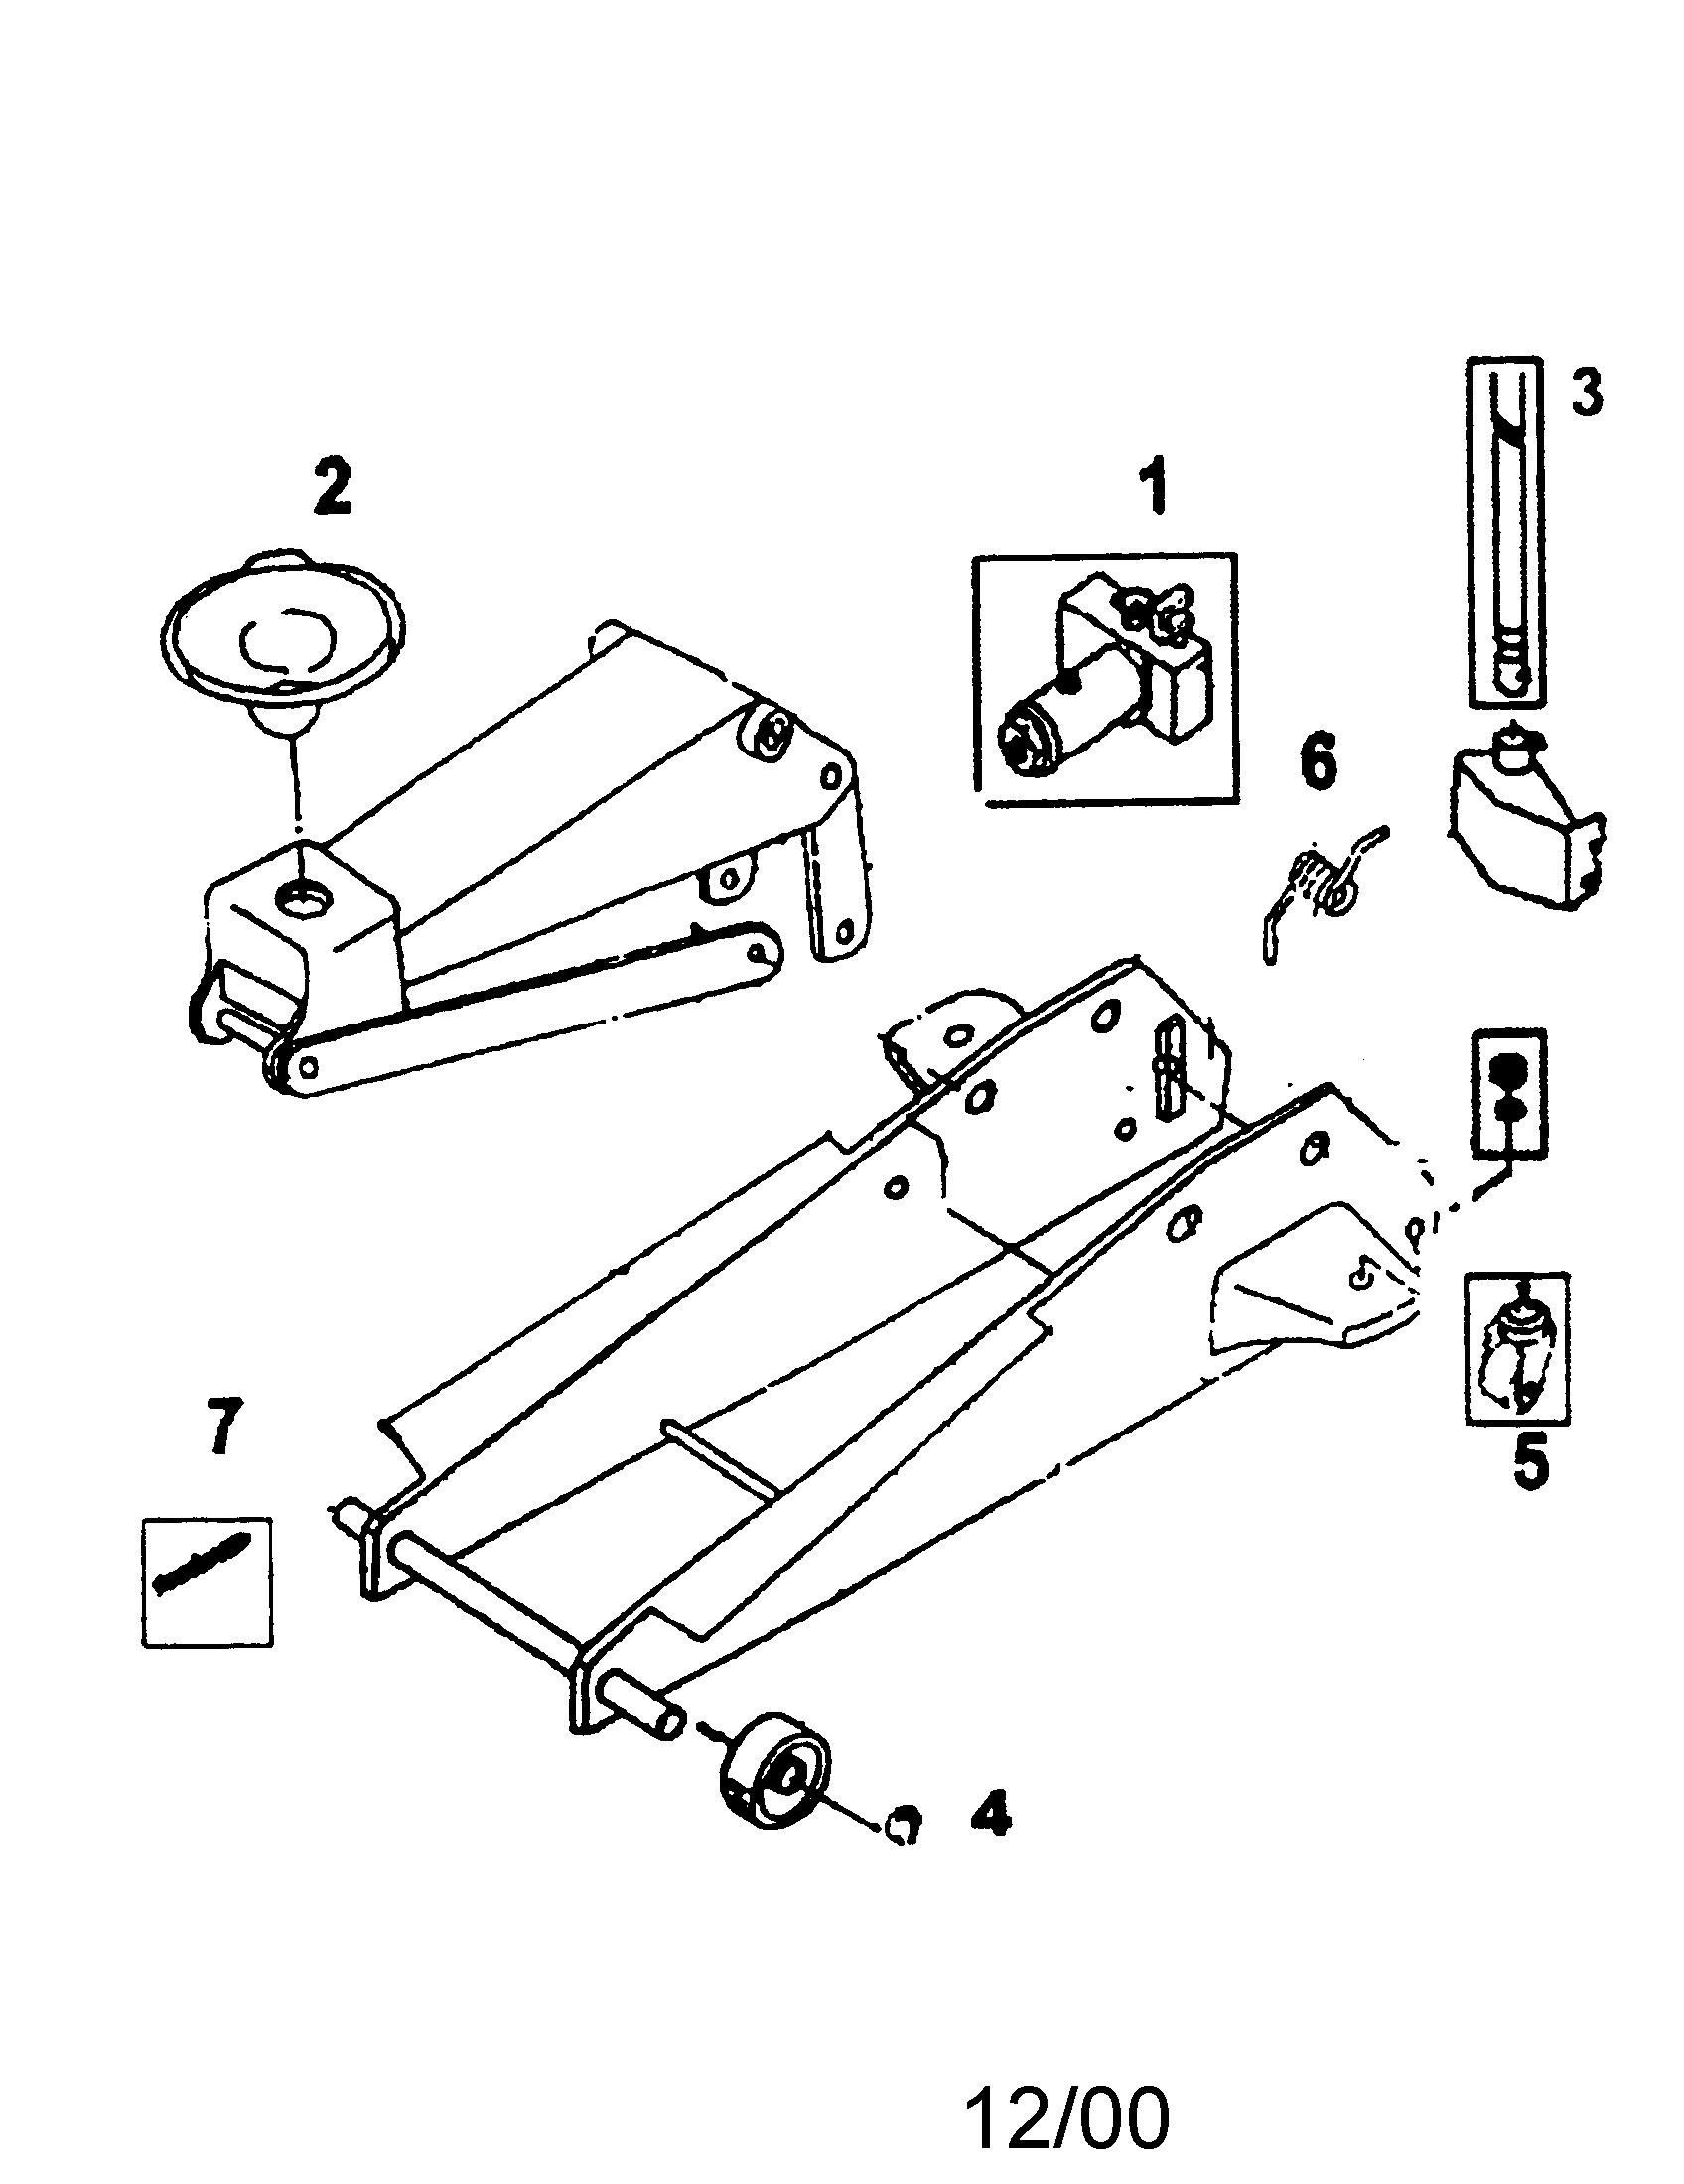 Craftsman model 875501390 jack hydraulic genuine parts